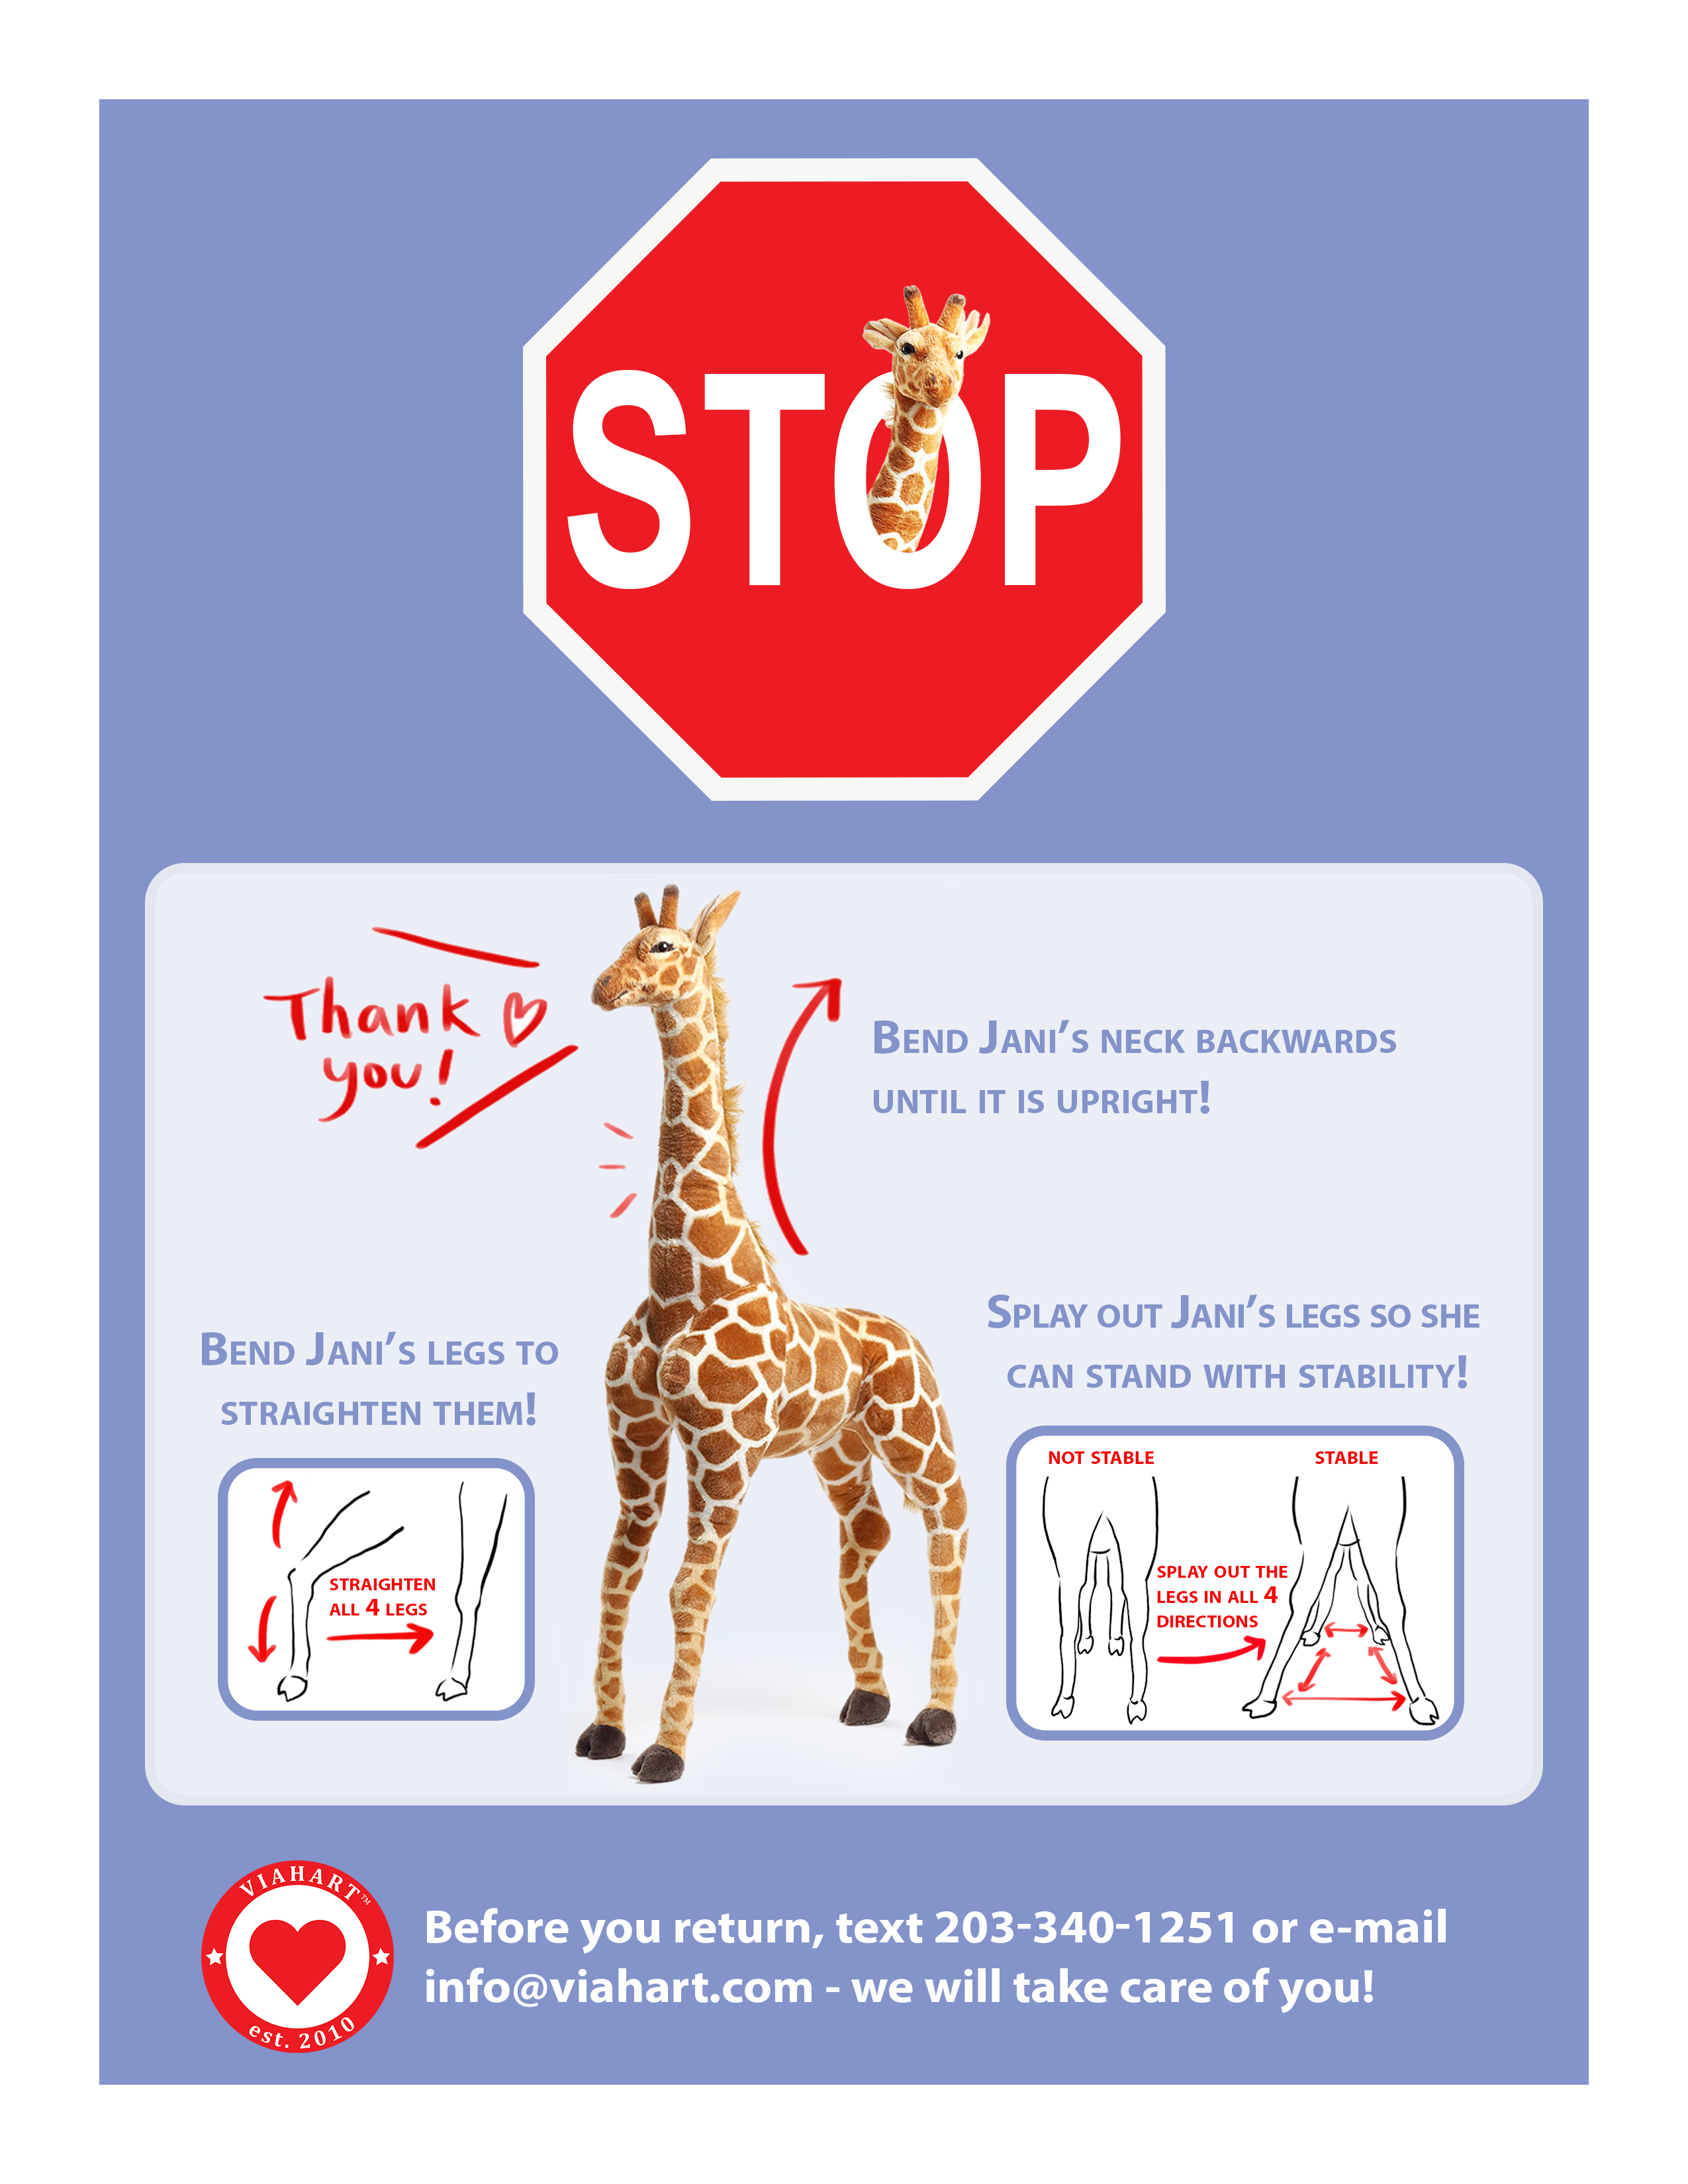 viahart-jani-stop-sign-3-.jpg